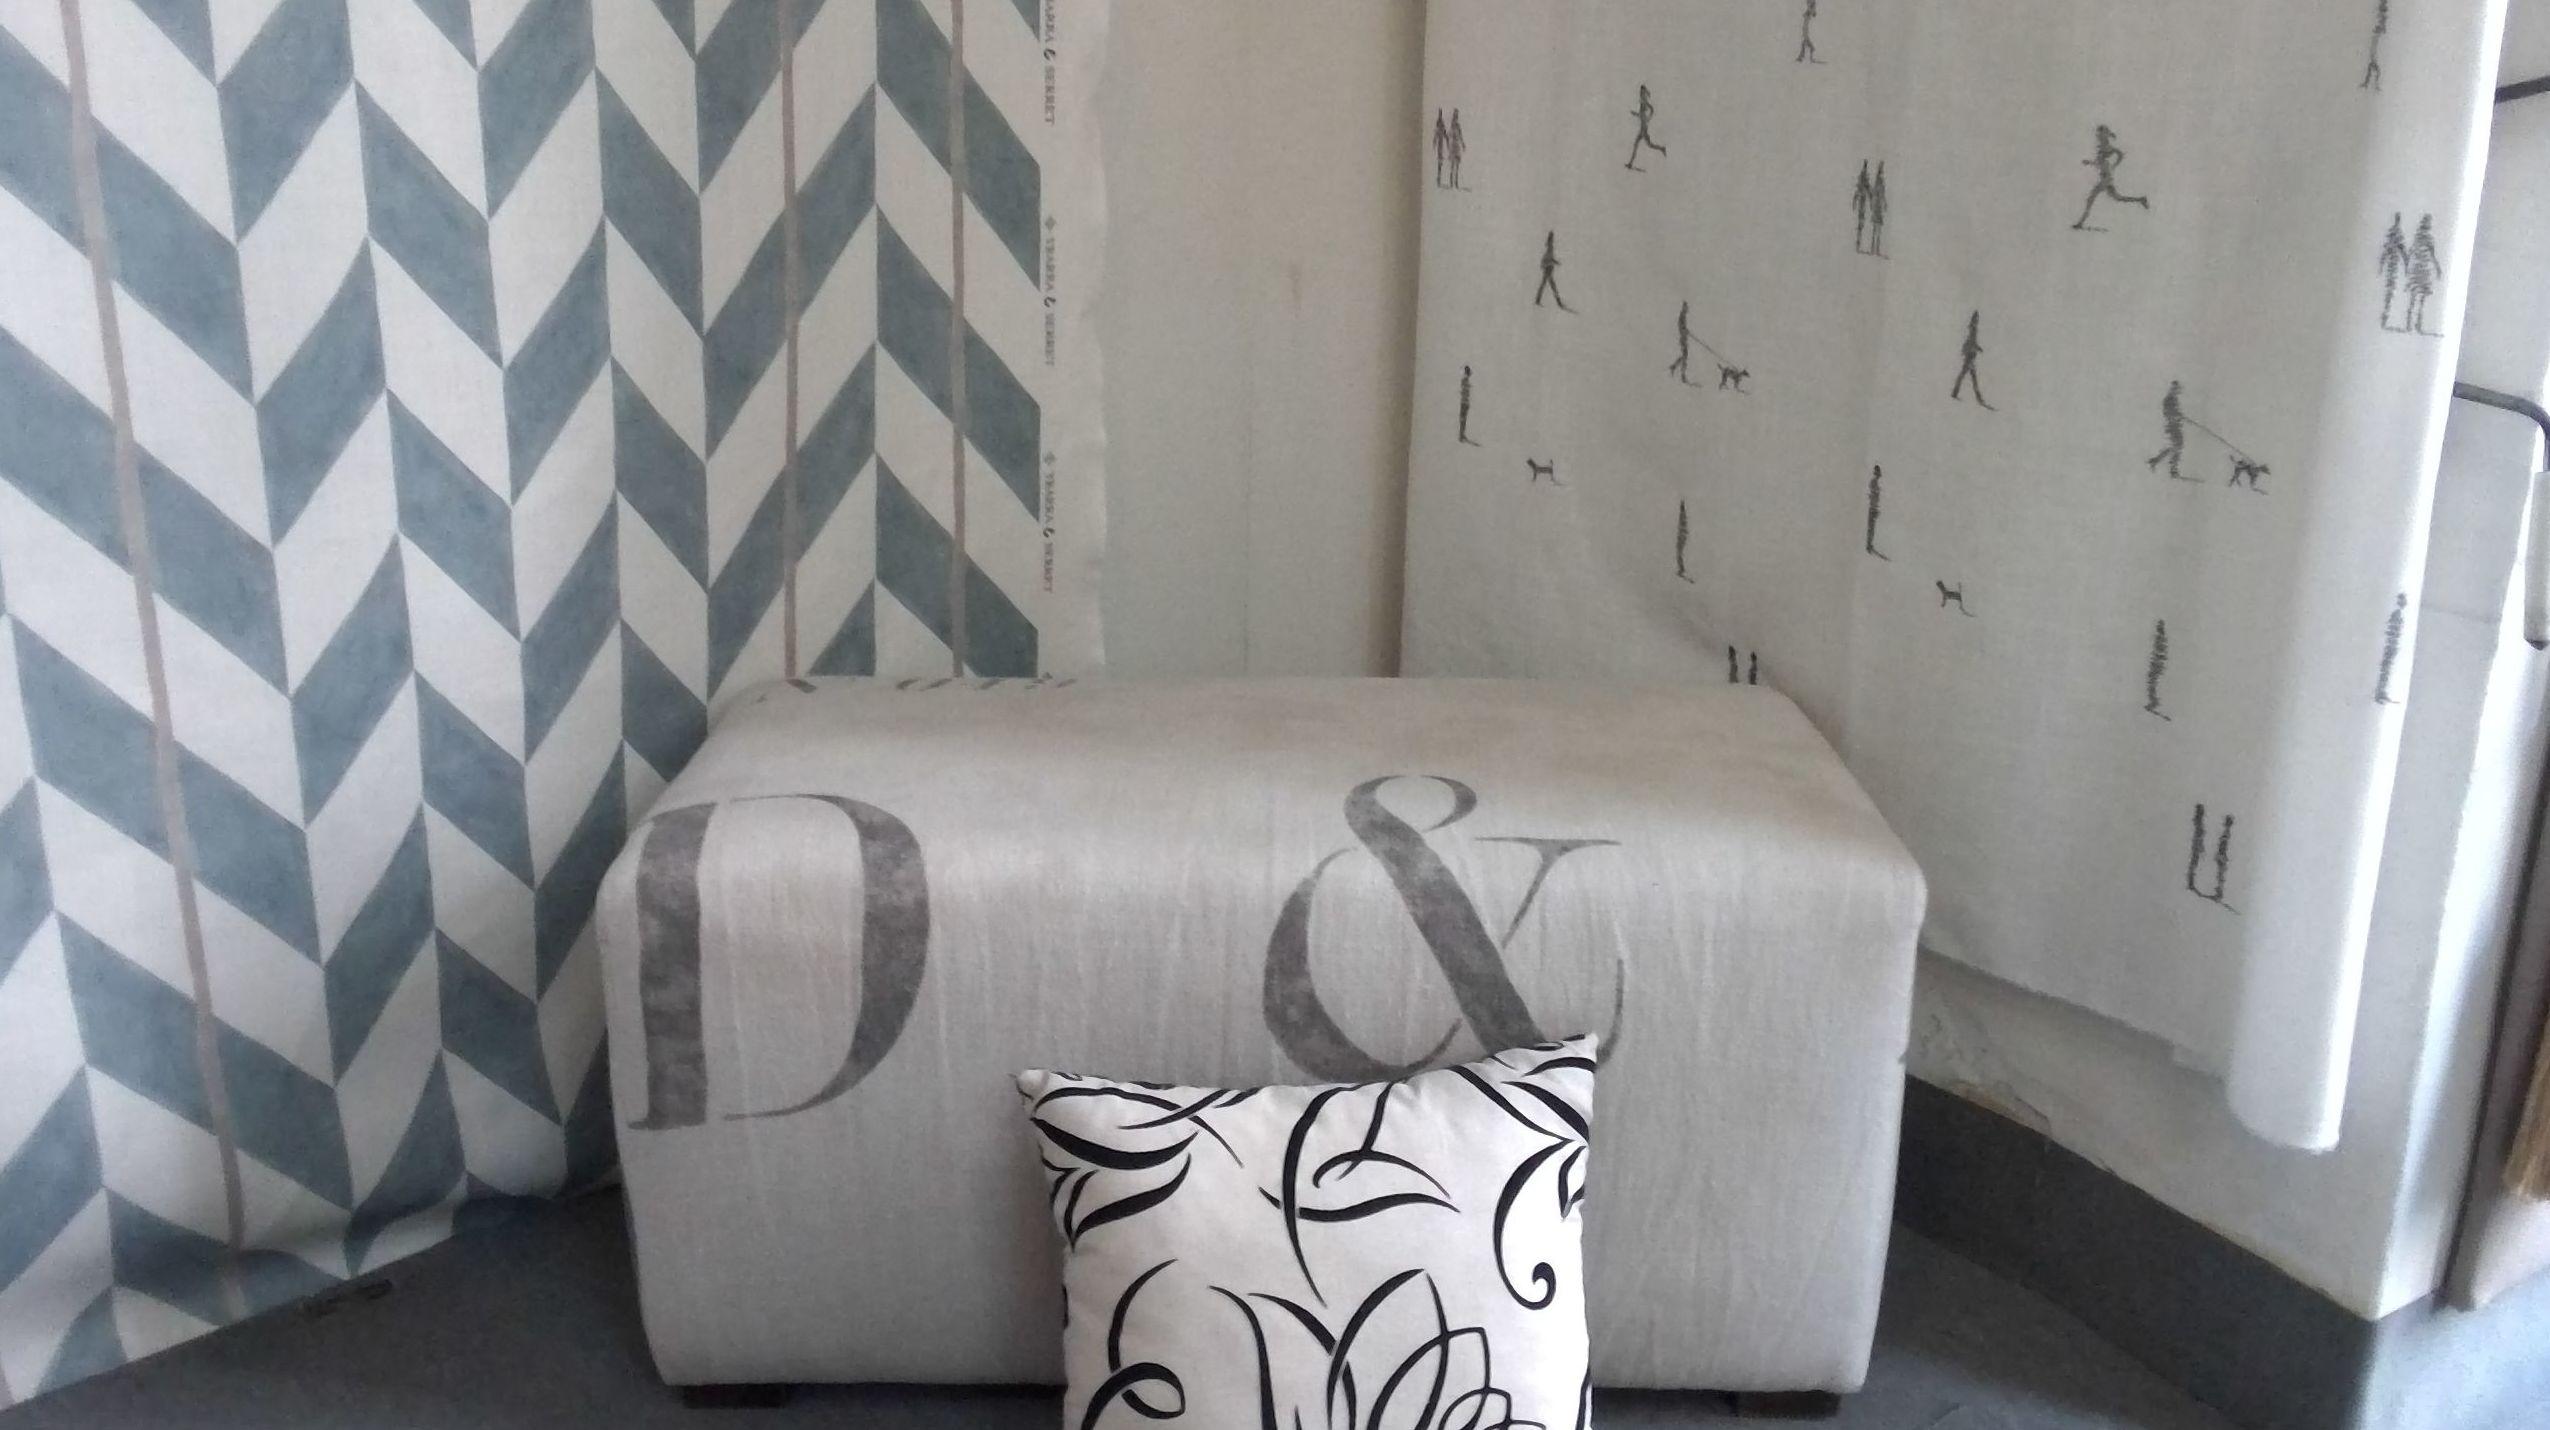 Foto 21 de Decoración textil en Madrid | Diseño Textil